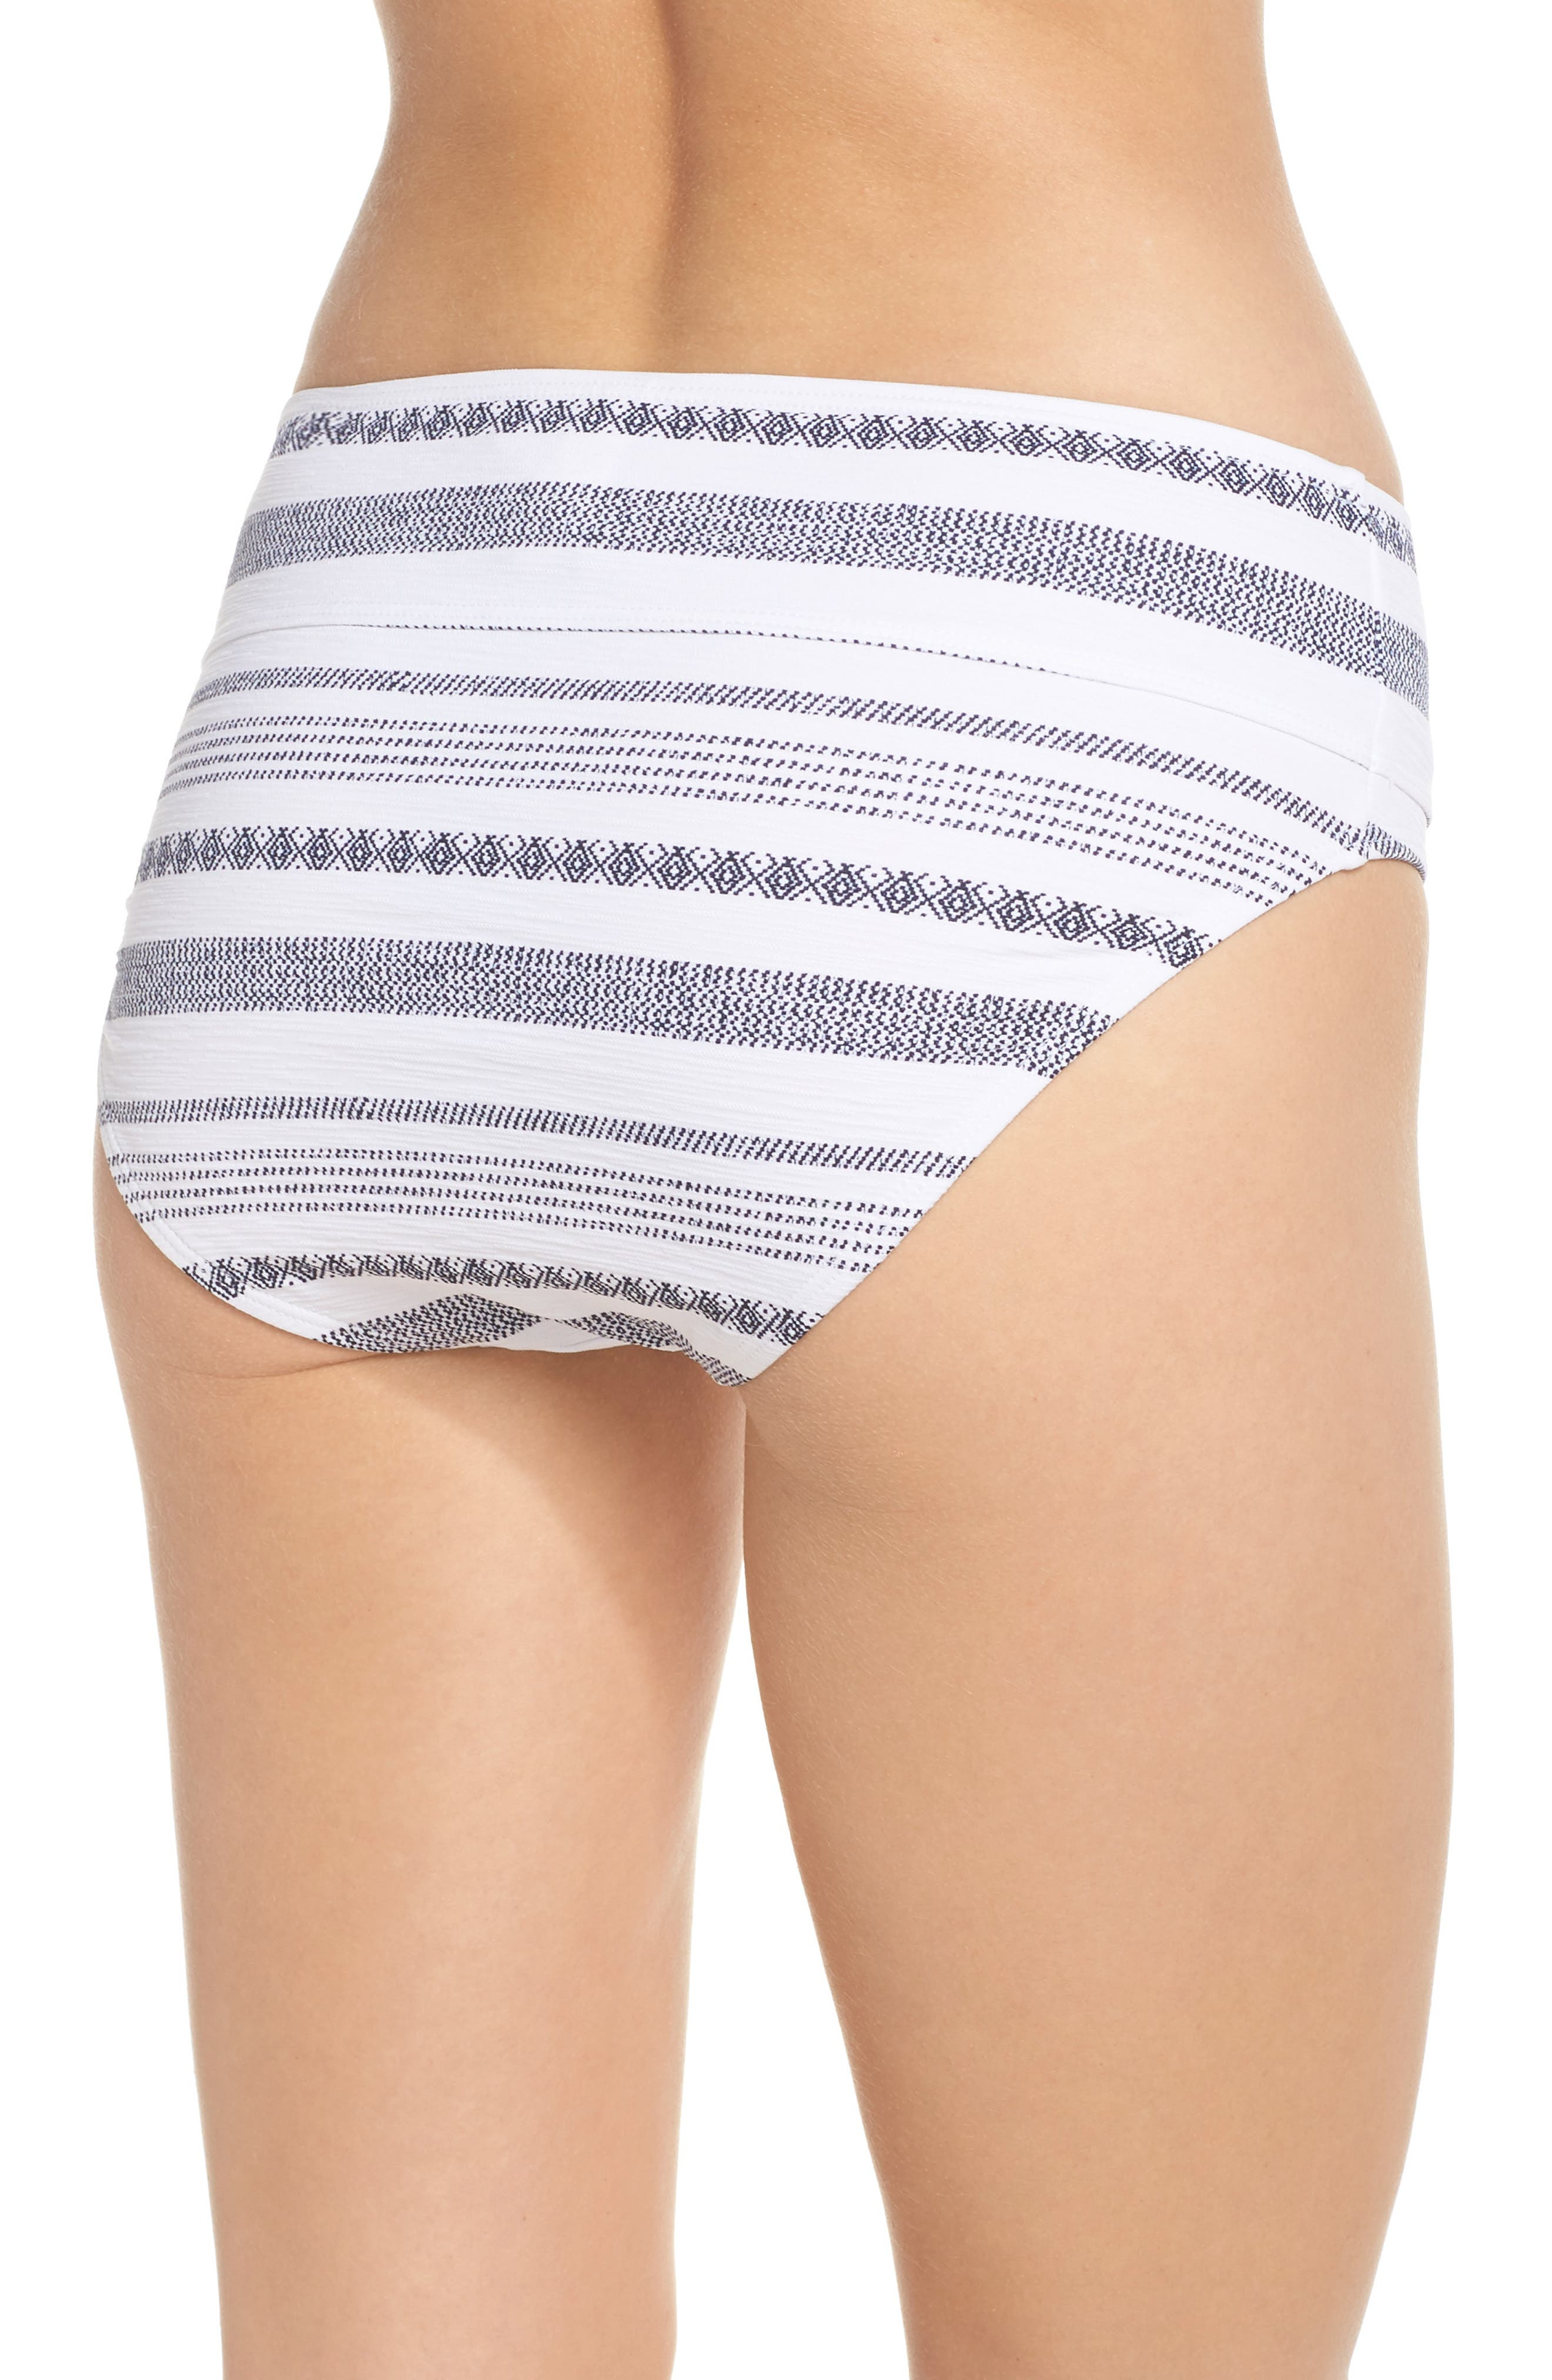 Sand Bar High Waist Bikini Bottoms,                             Alternate thumbnail 2, color,                             White